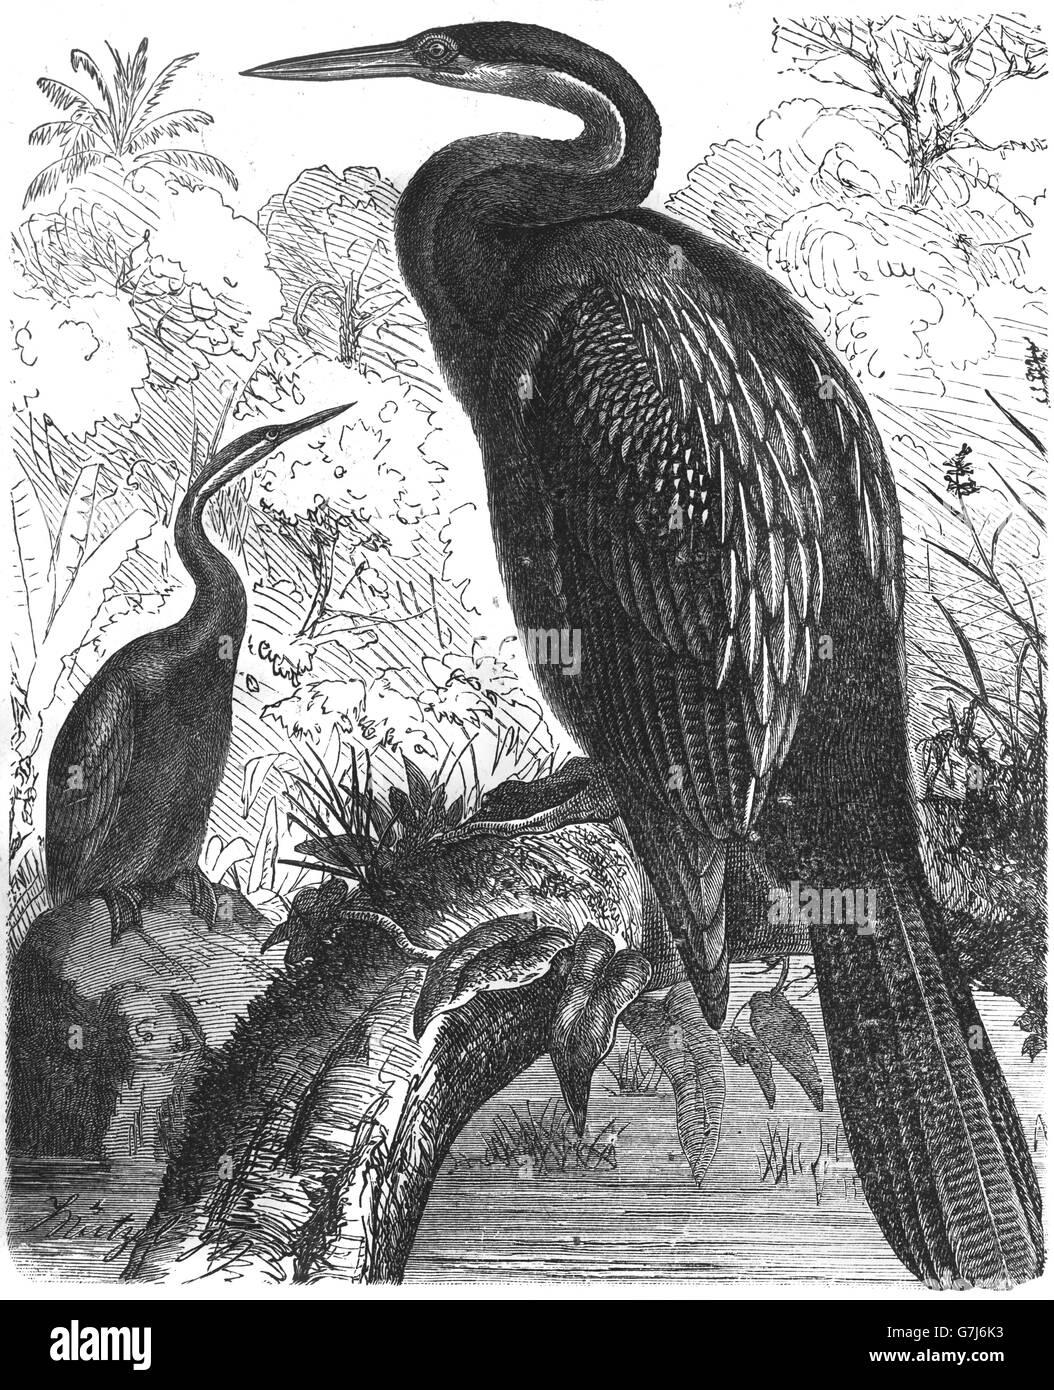 Anhinga, Anhinga anhinga, snakebird, American darter, illustration from book dated 1904 Stock Photo